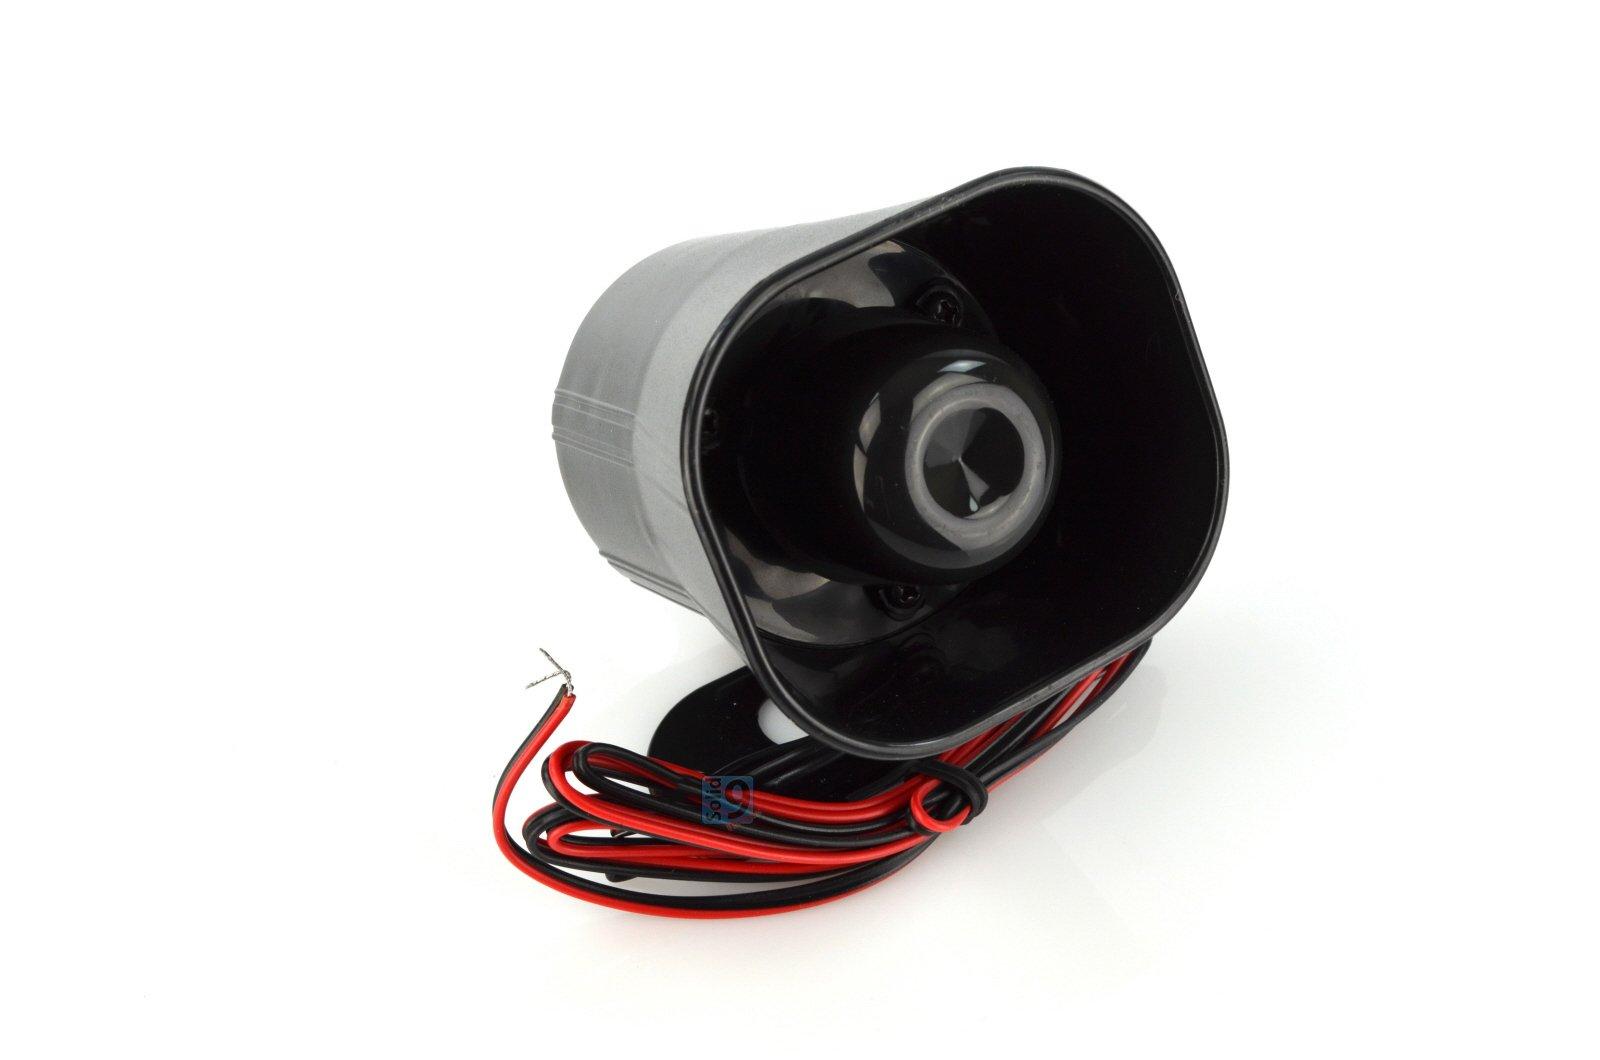 Viper 5906V Color Remote Start & Security by Viper